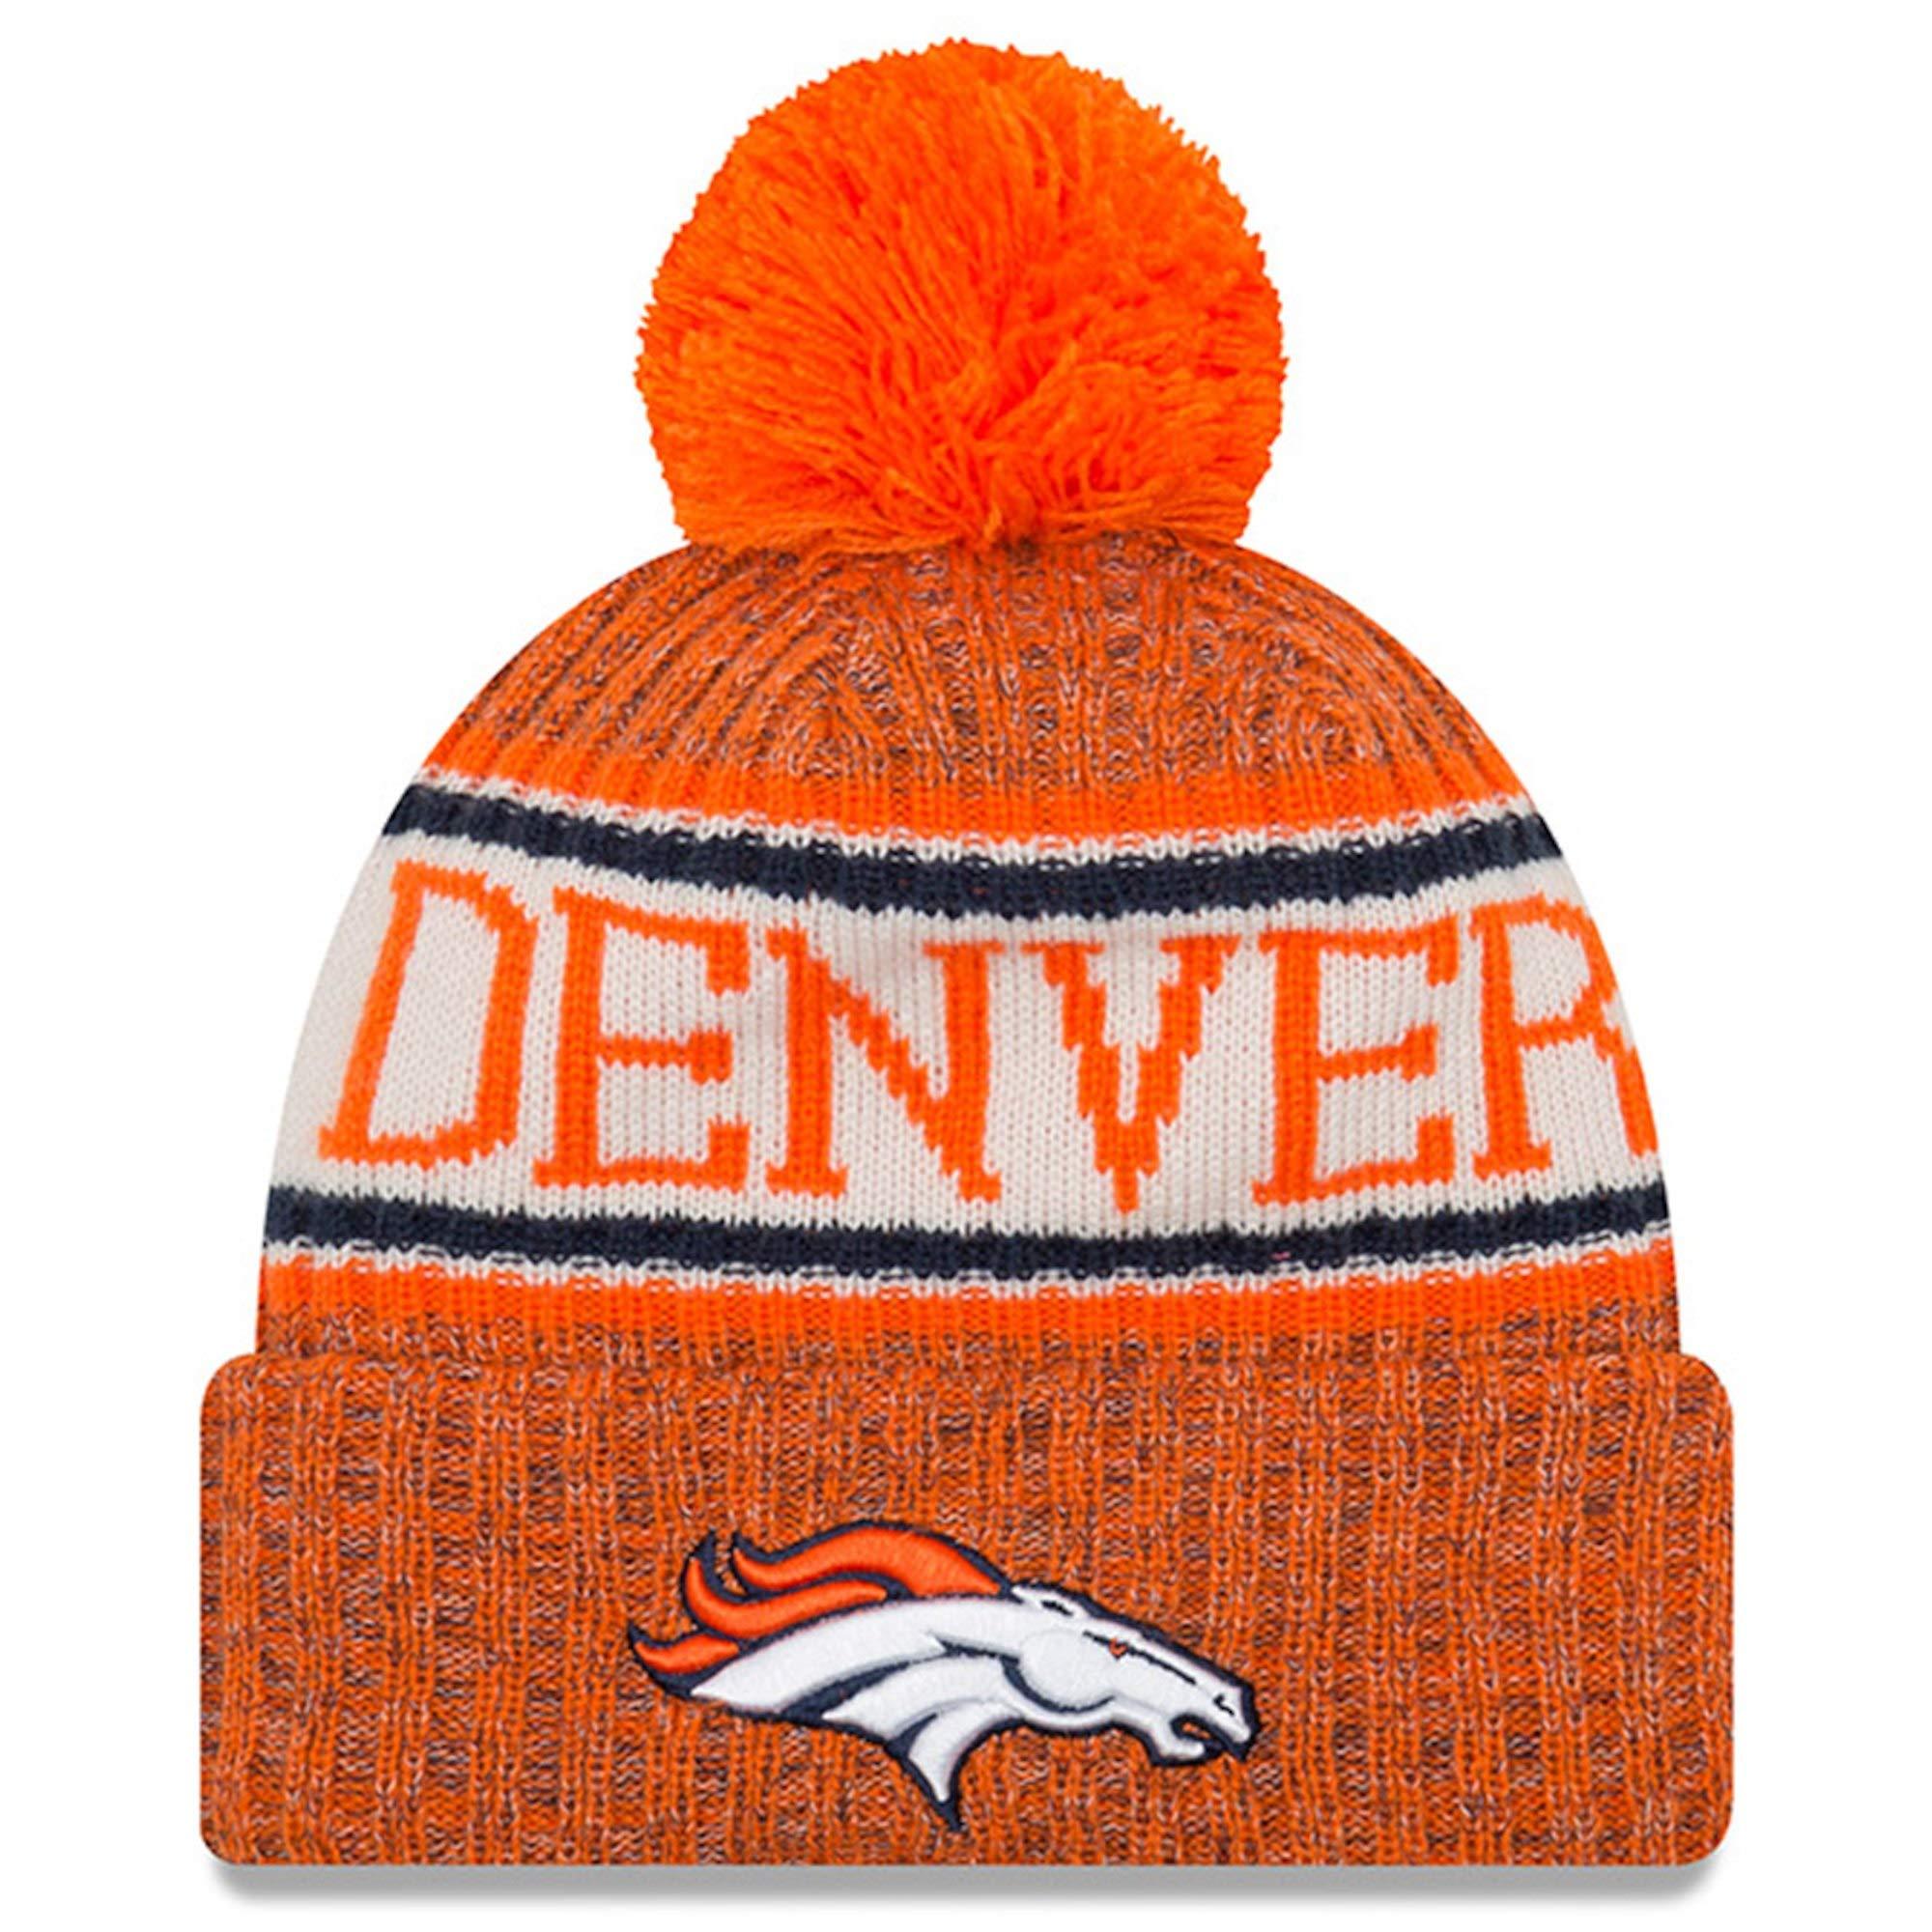 New Era Knit Denver Broncos Biggest Fan Redux Sport Knit Winter Stocking Beanie Pom Hat Cap NFL